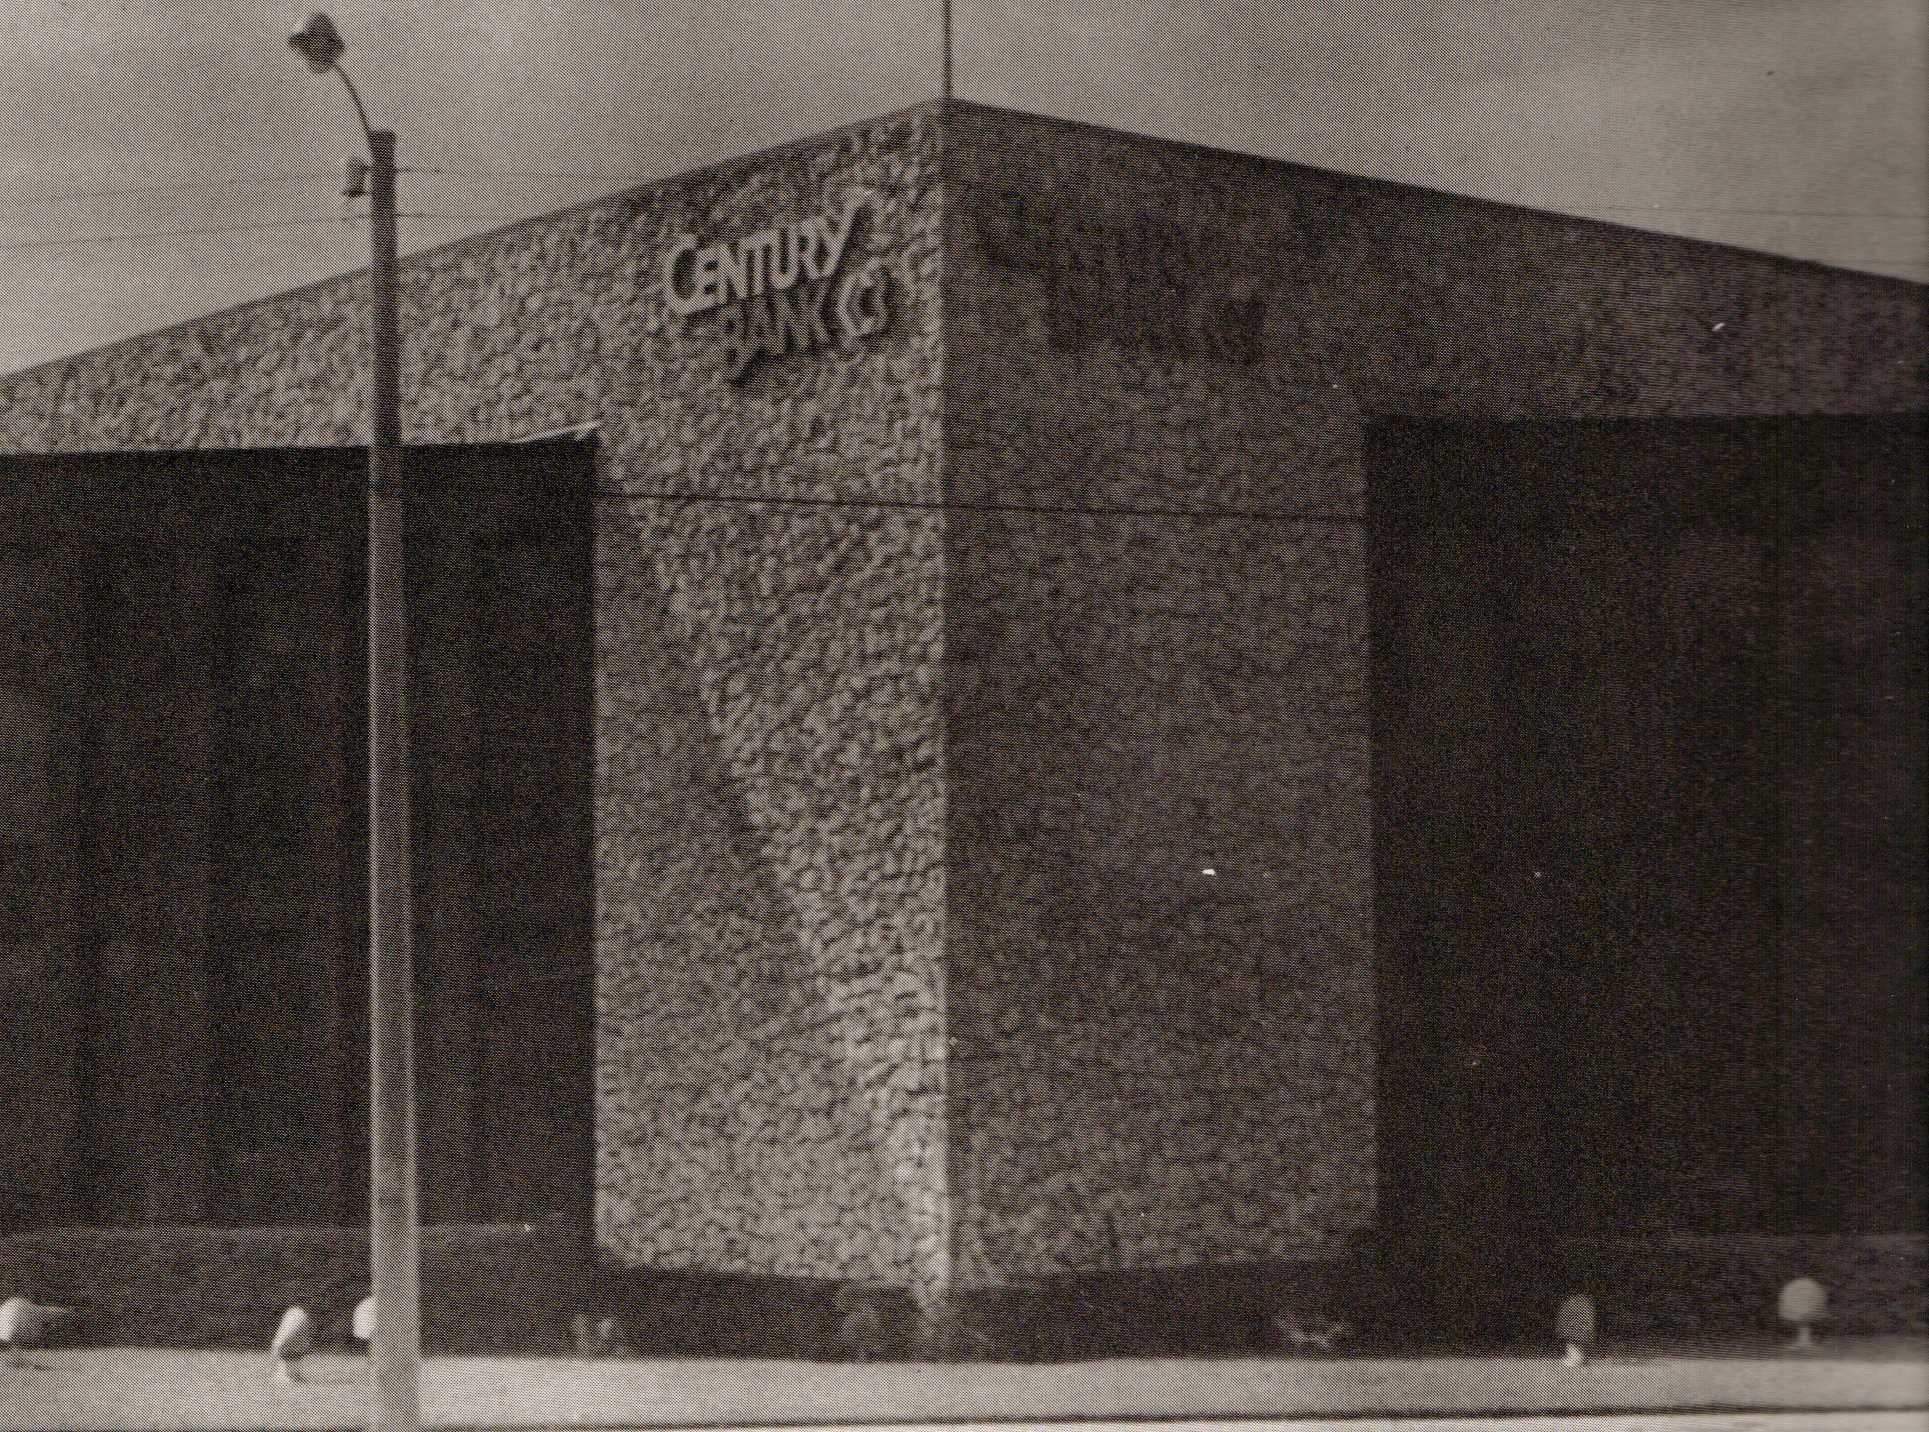 Century Bank, 601 Reid Street, Palatka, in 1981. This